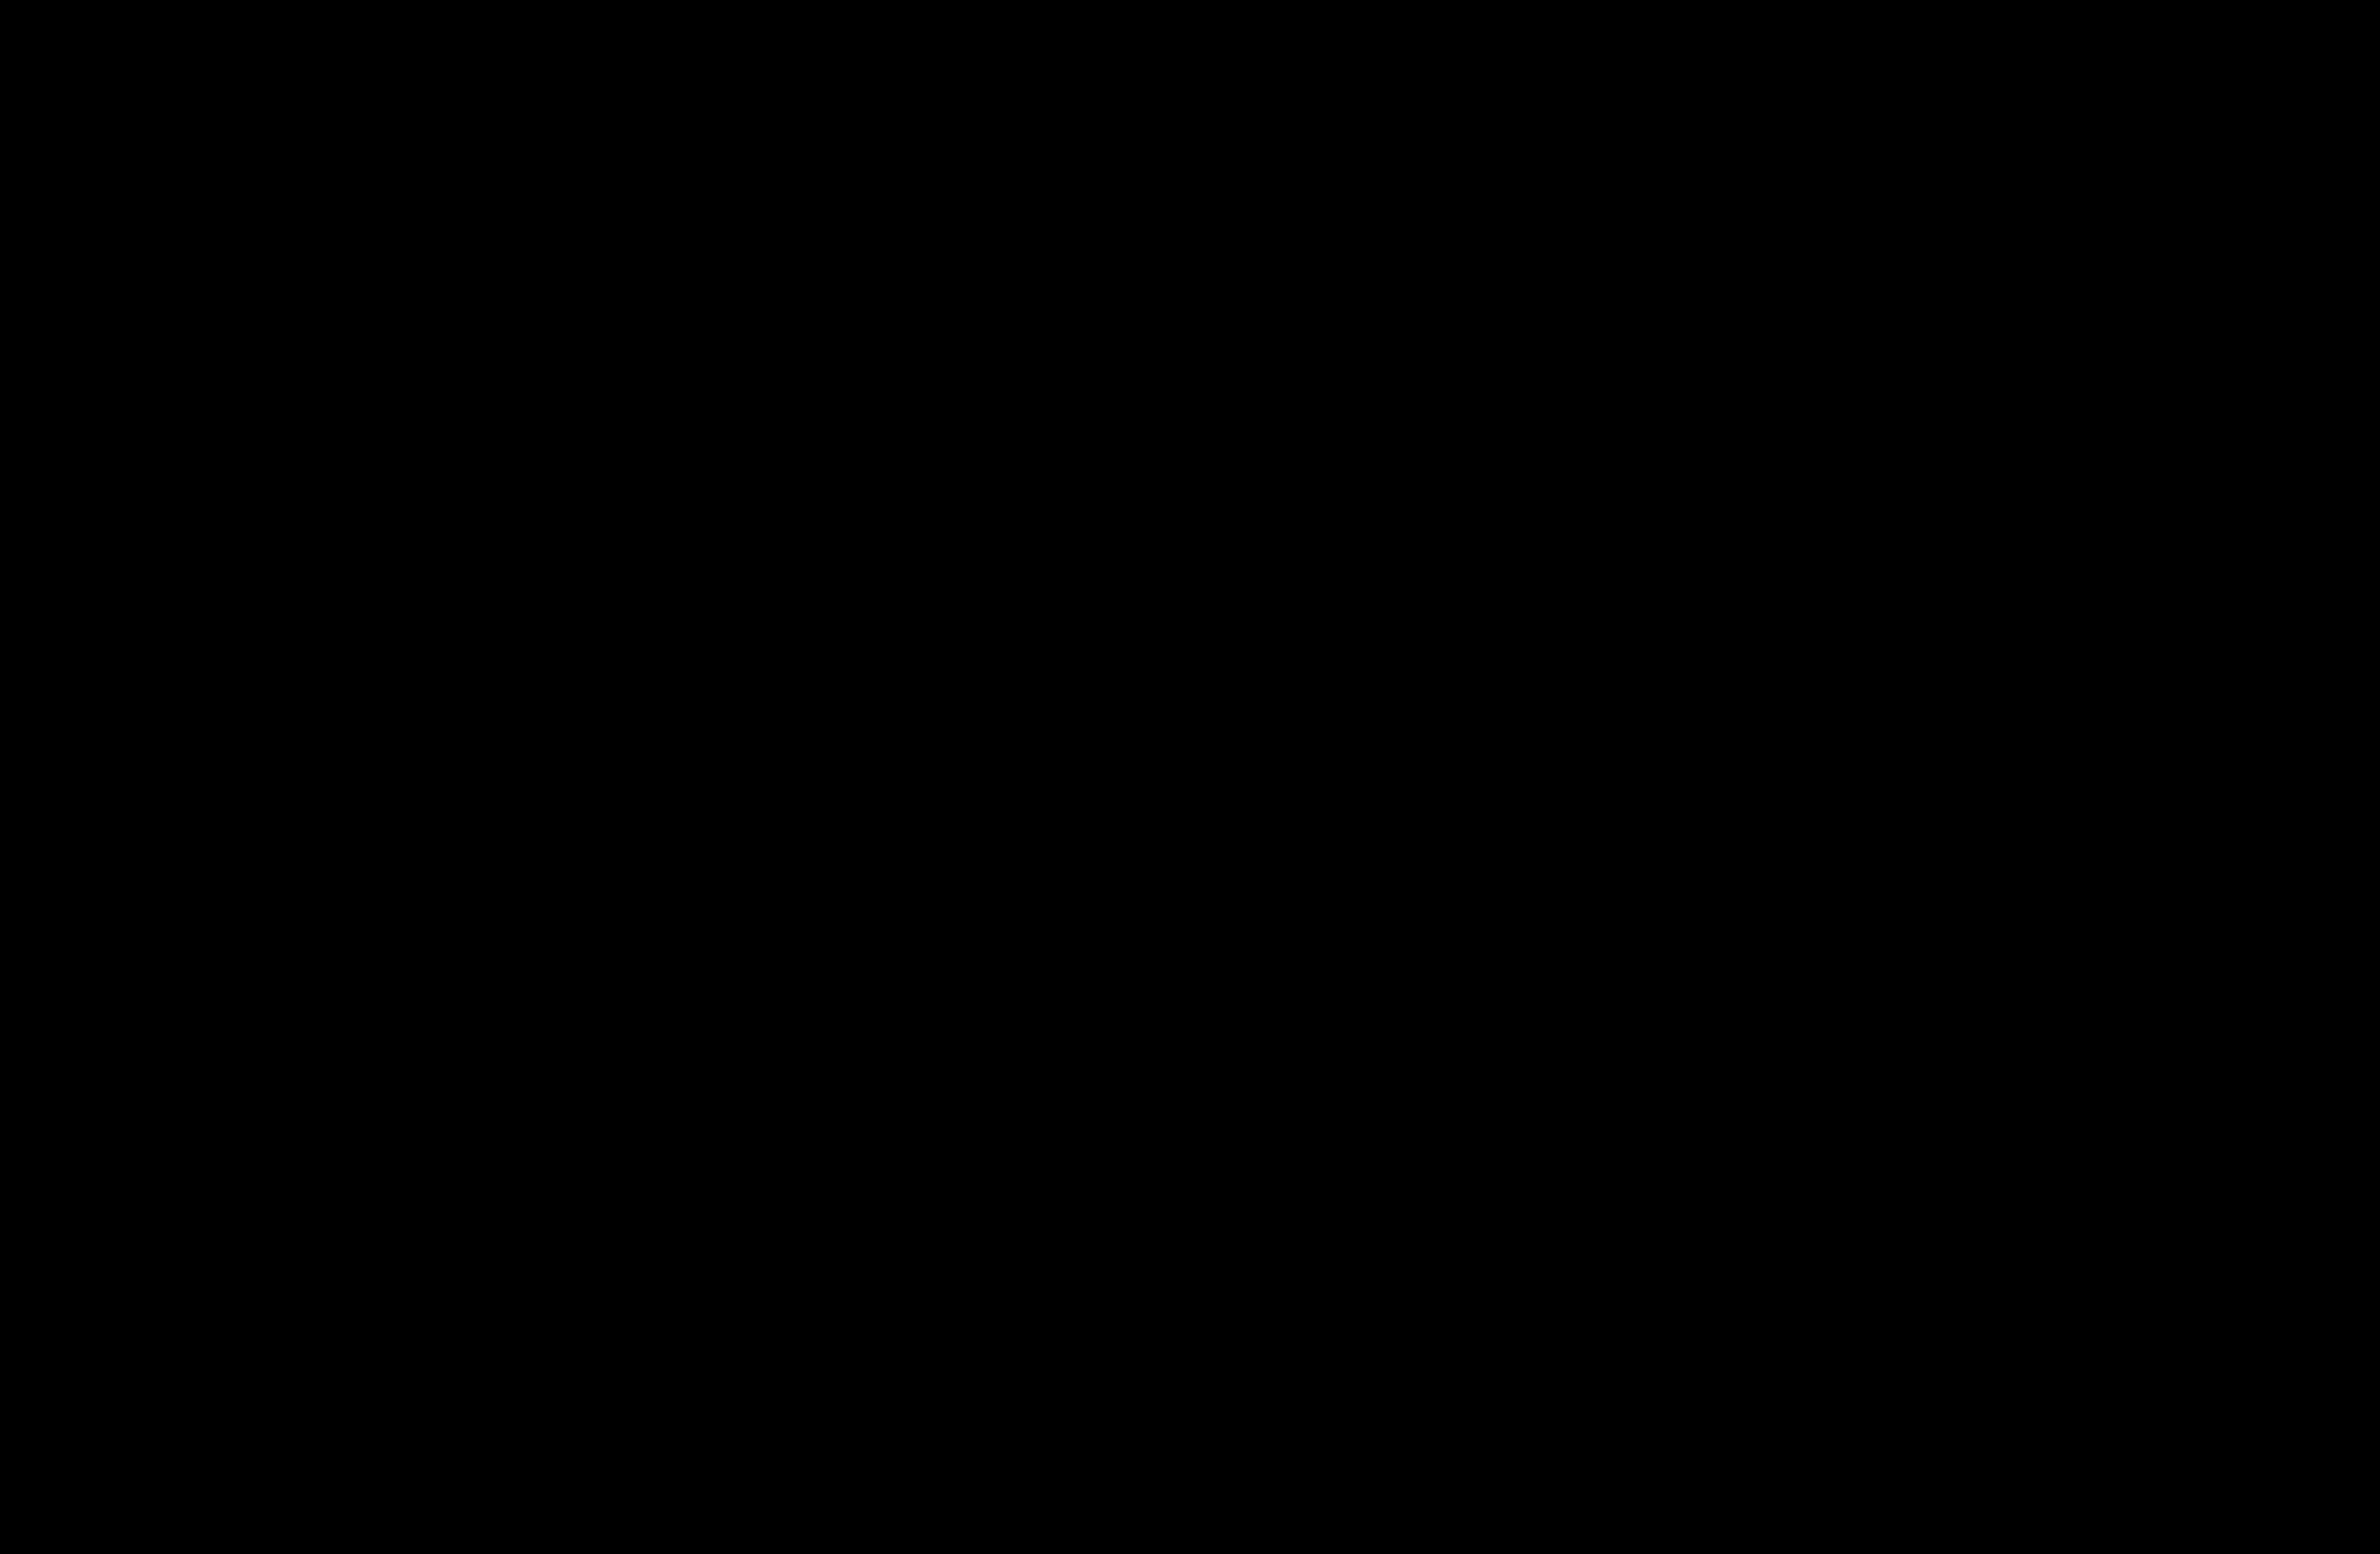 _2BP0543_A